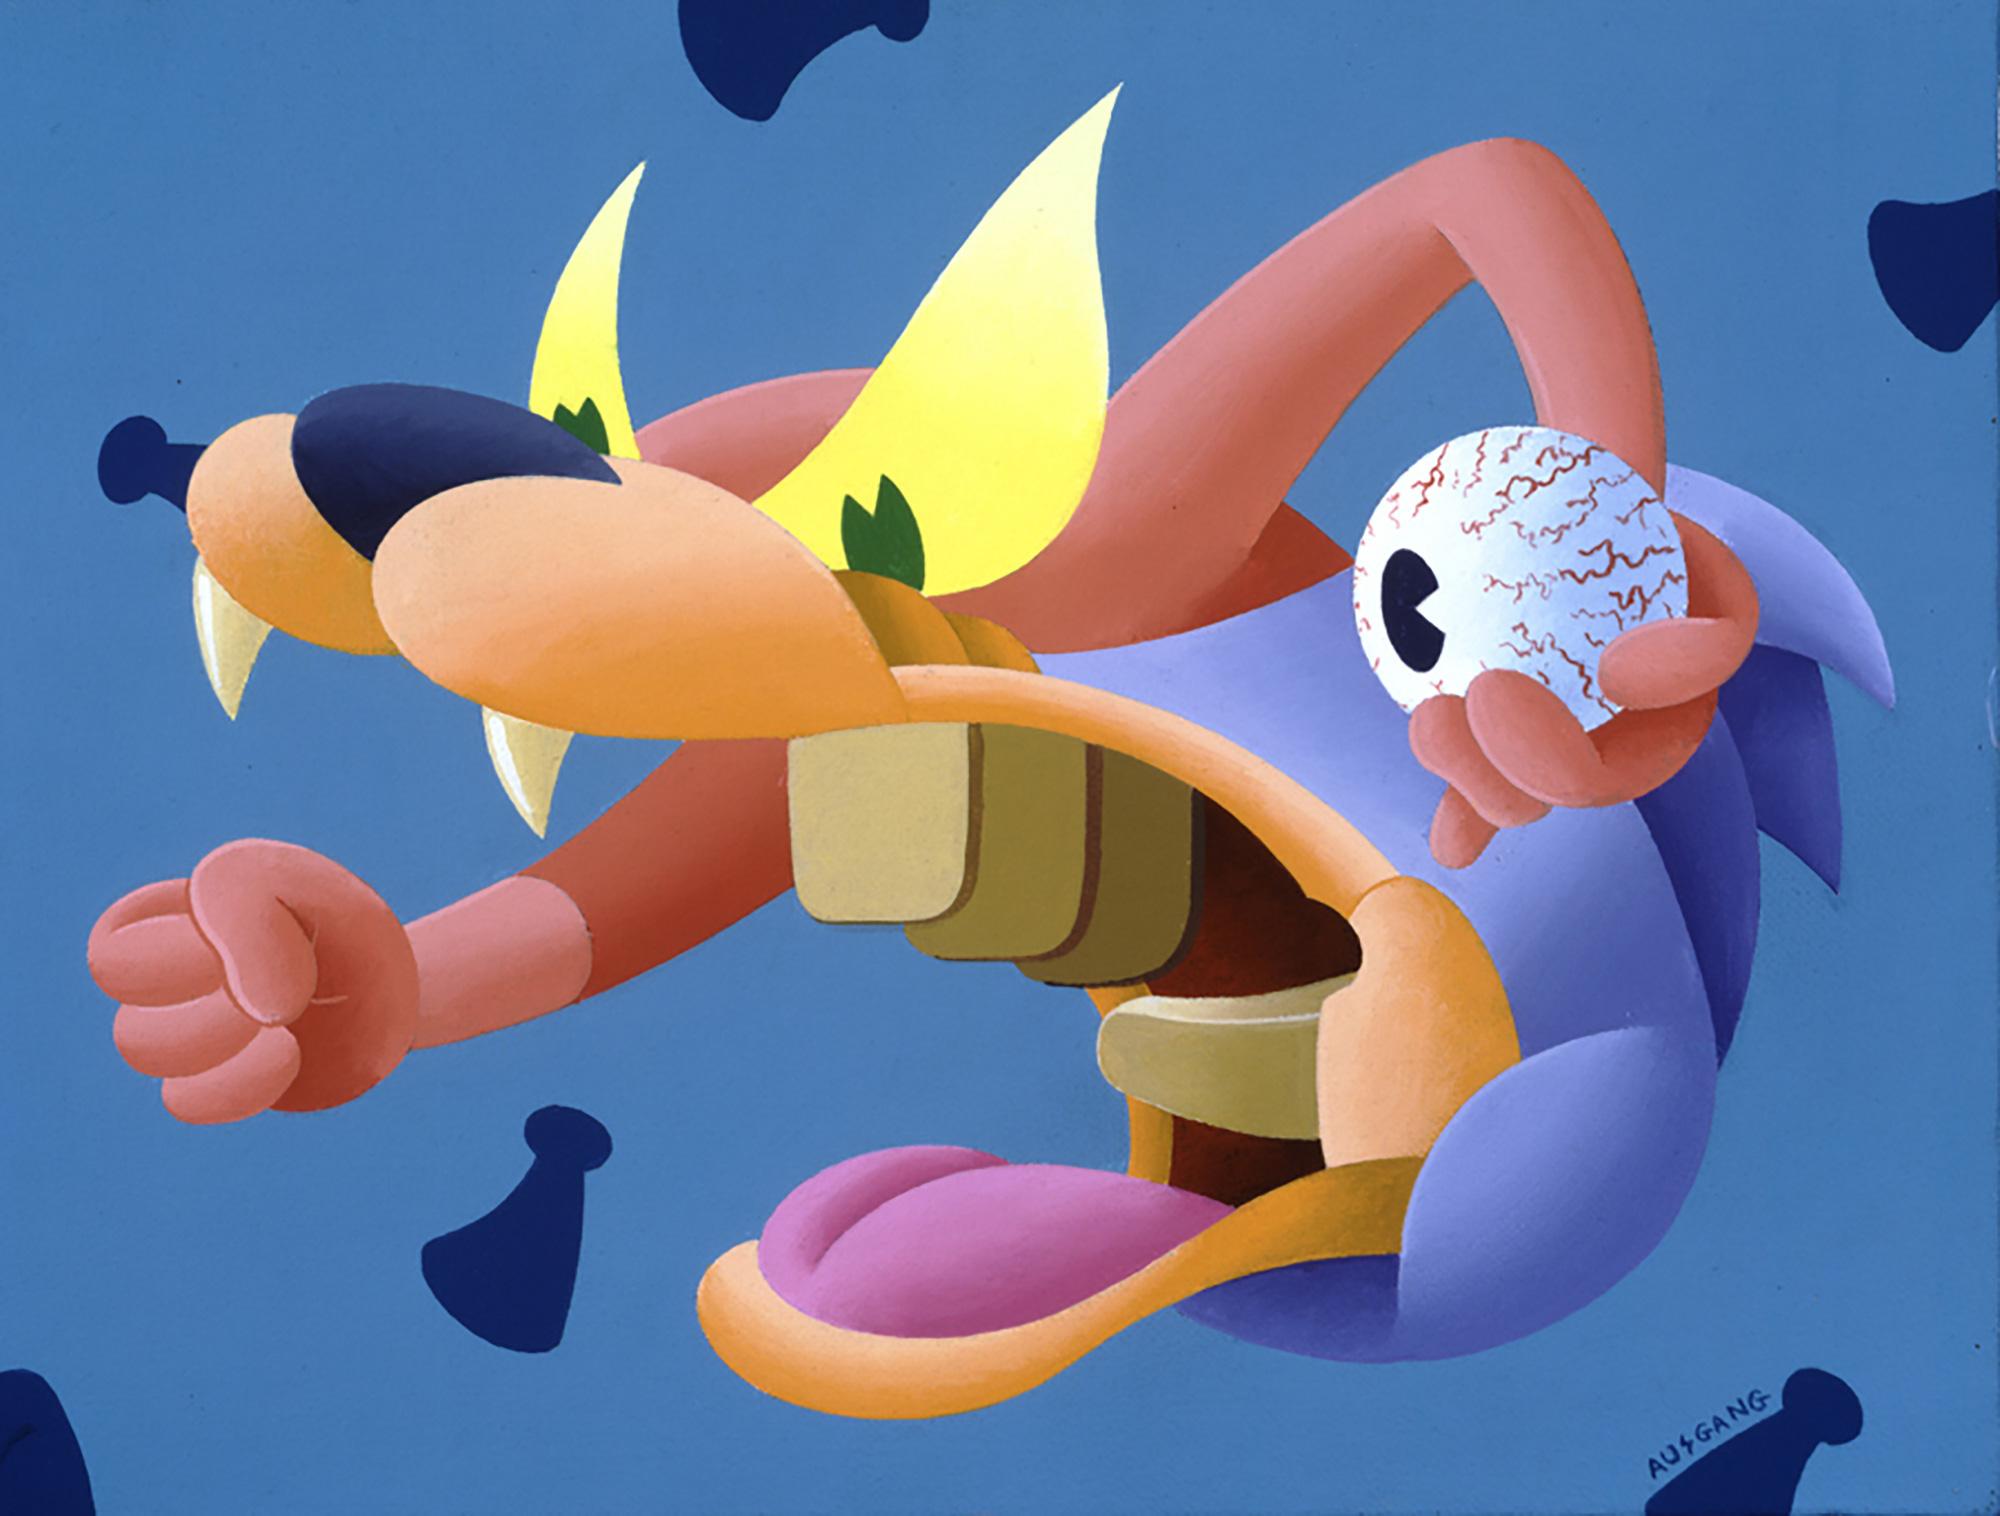 Punch, 1995